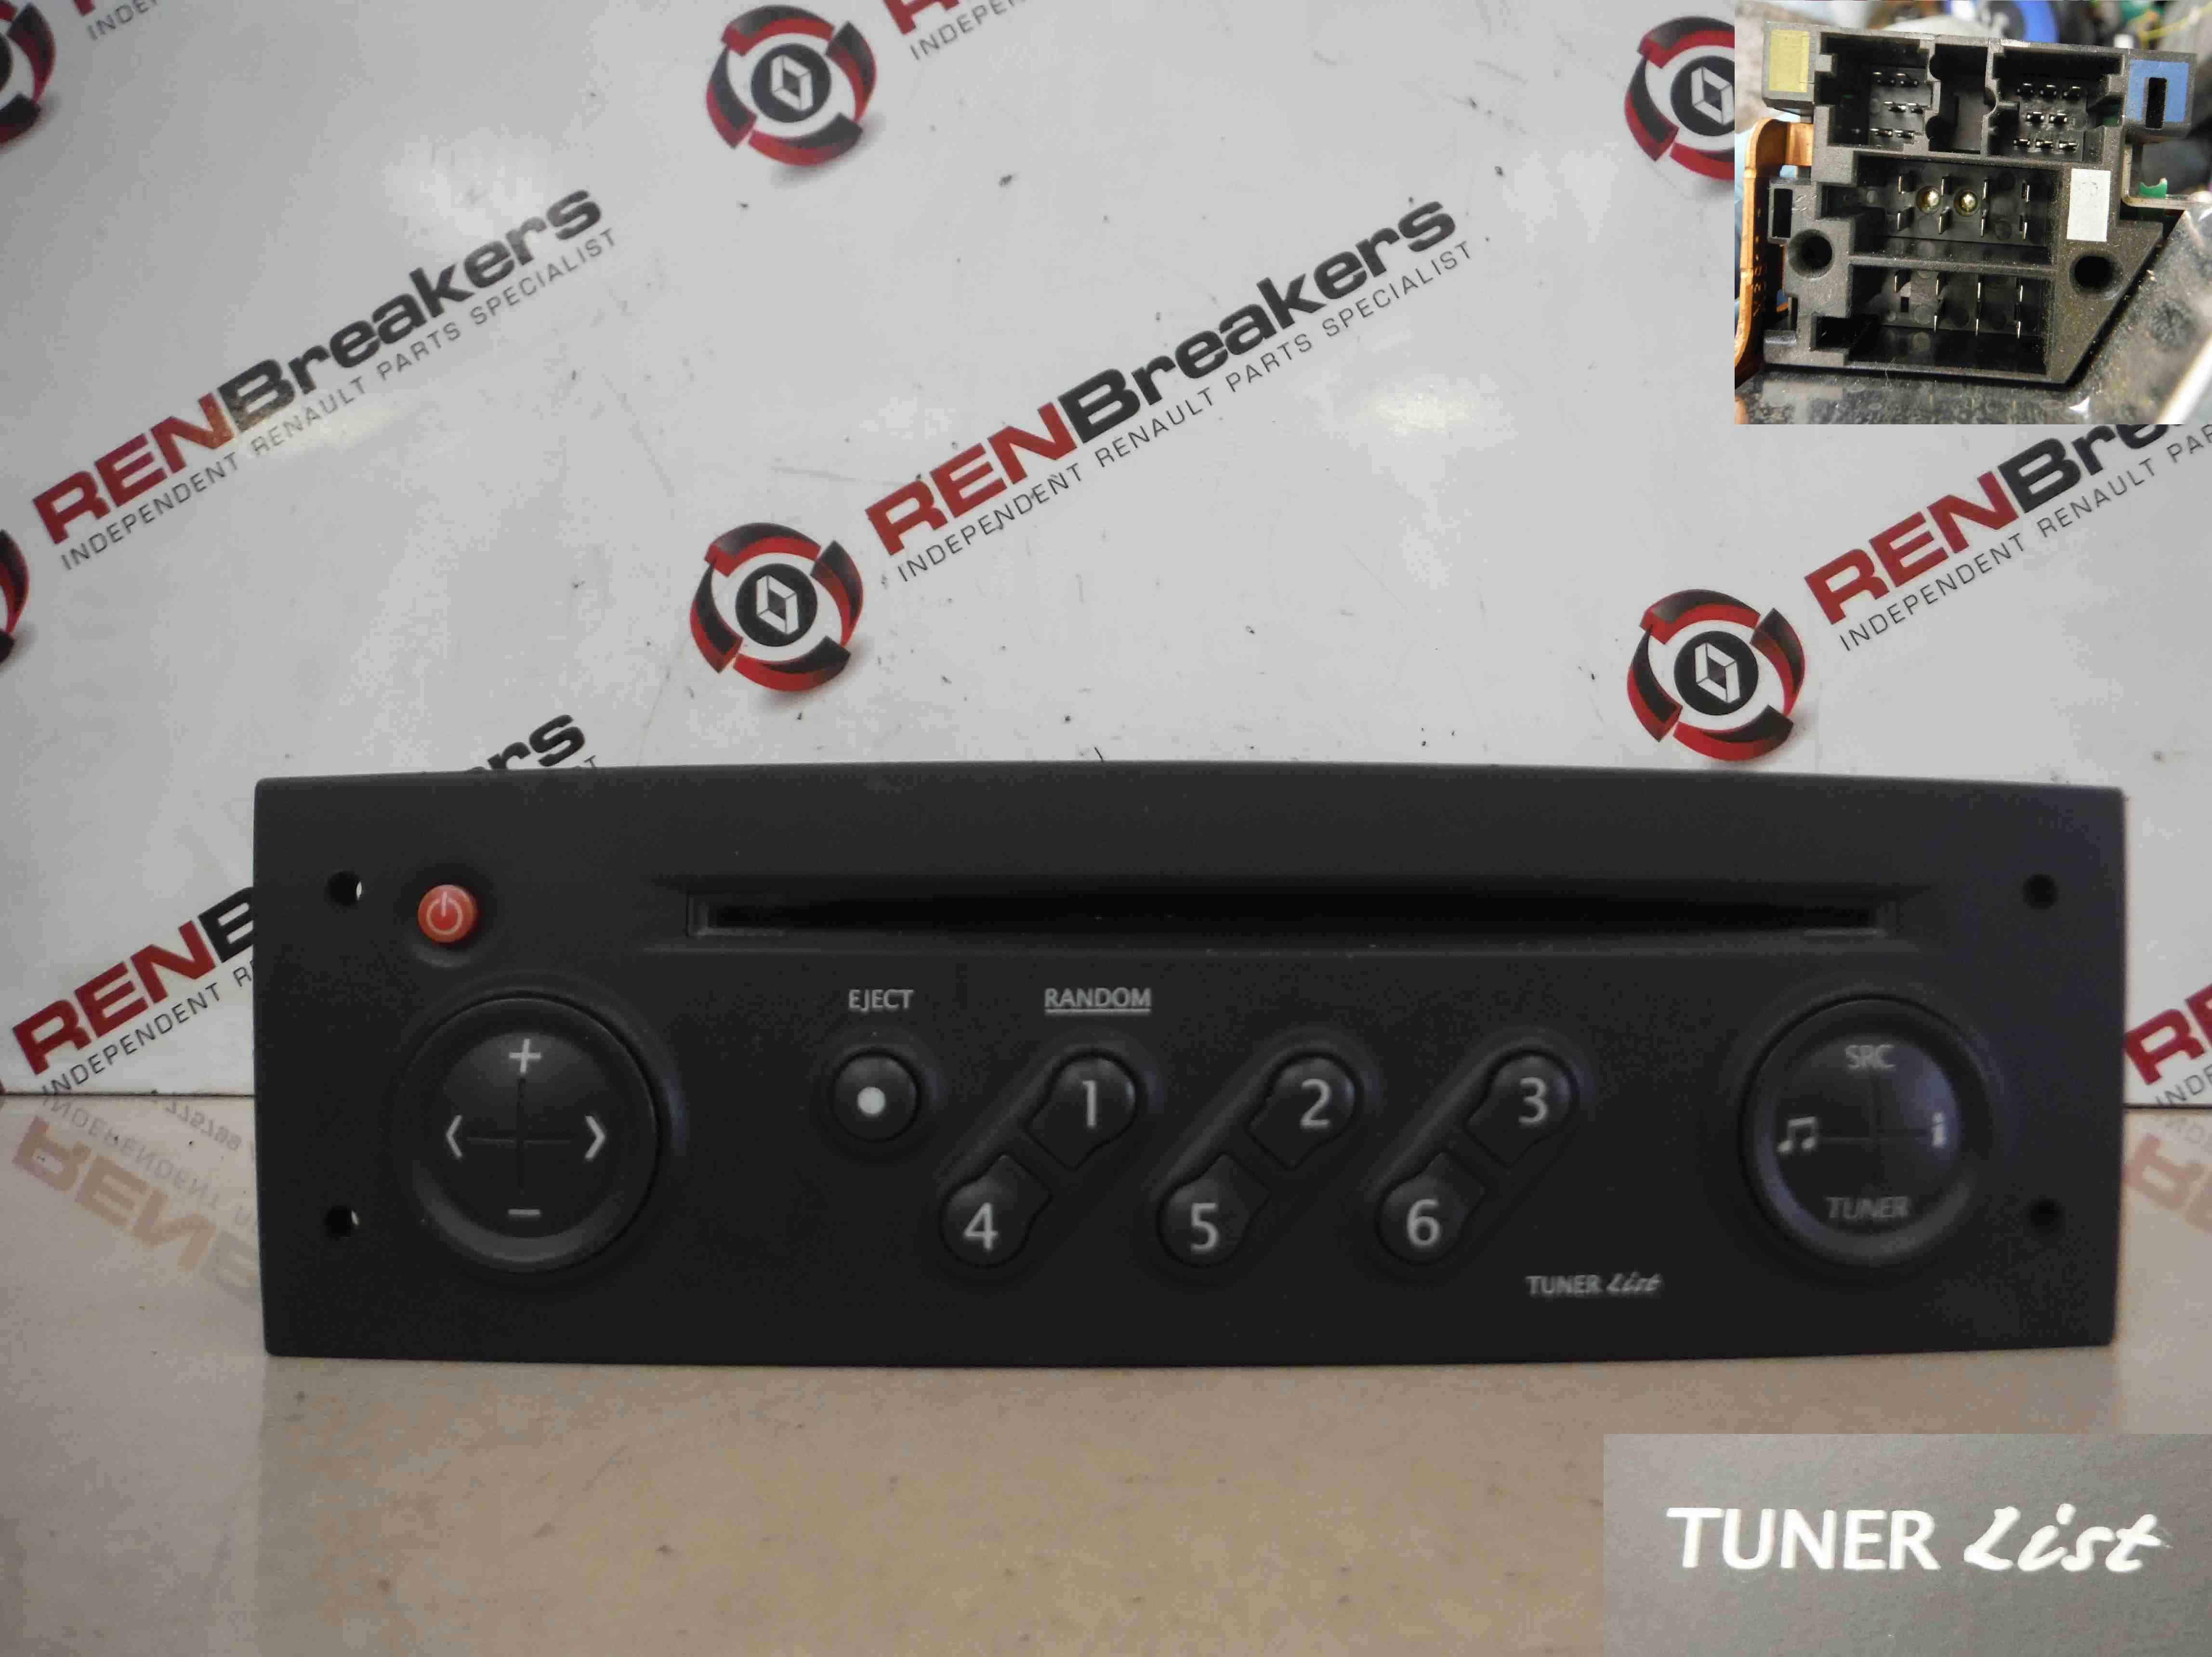 Renault Megane 2002-2008 Radio Cd Player Tuner List + Code 8200256141